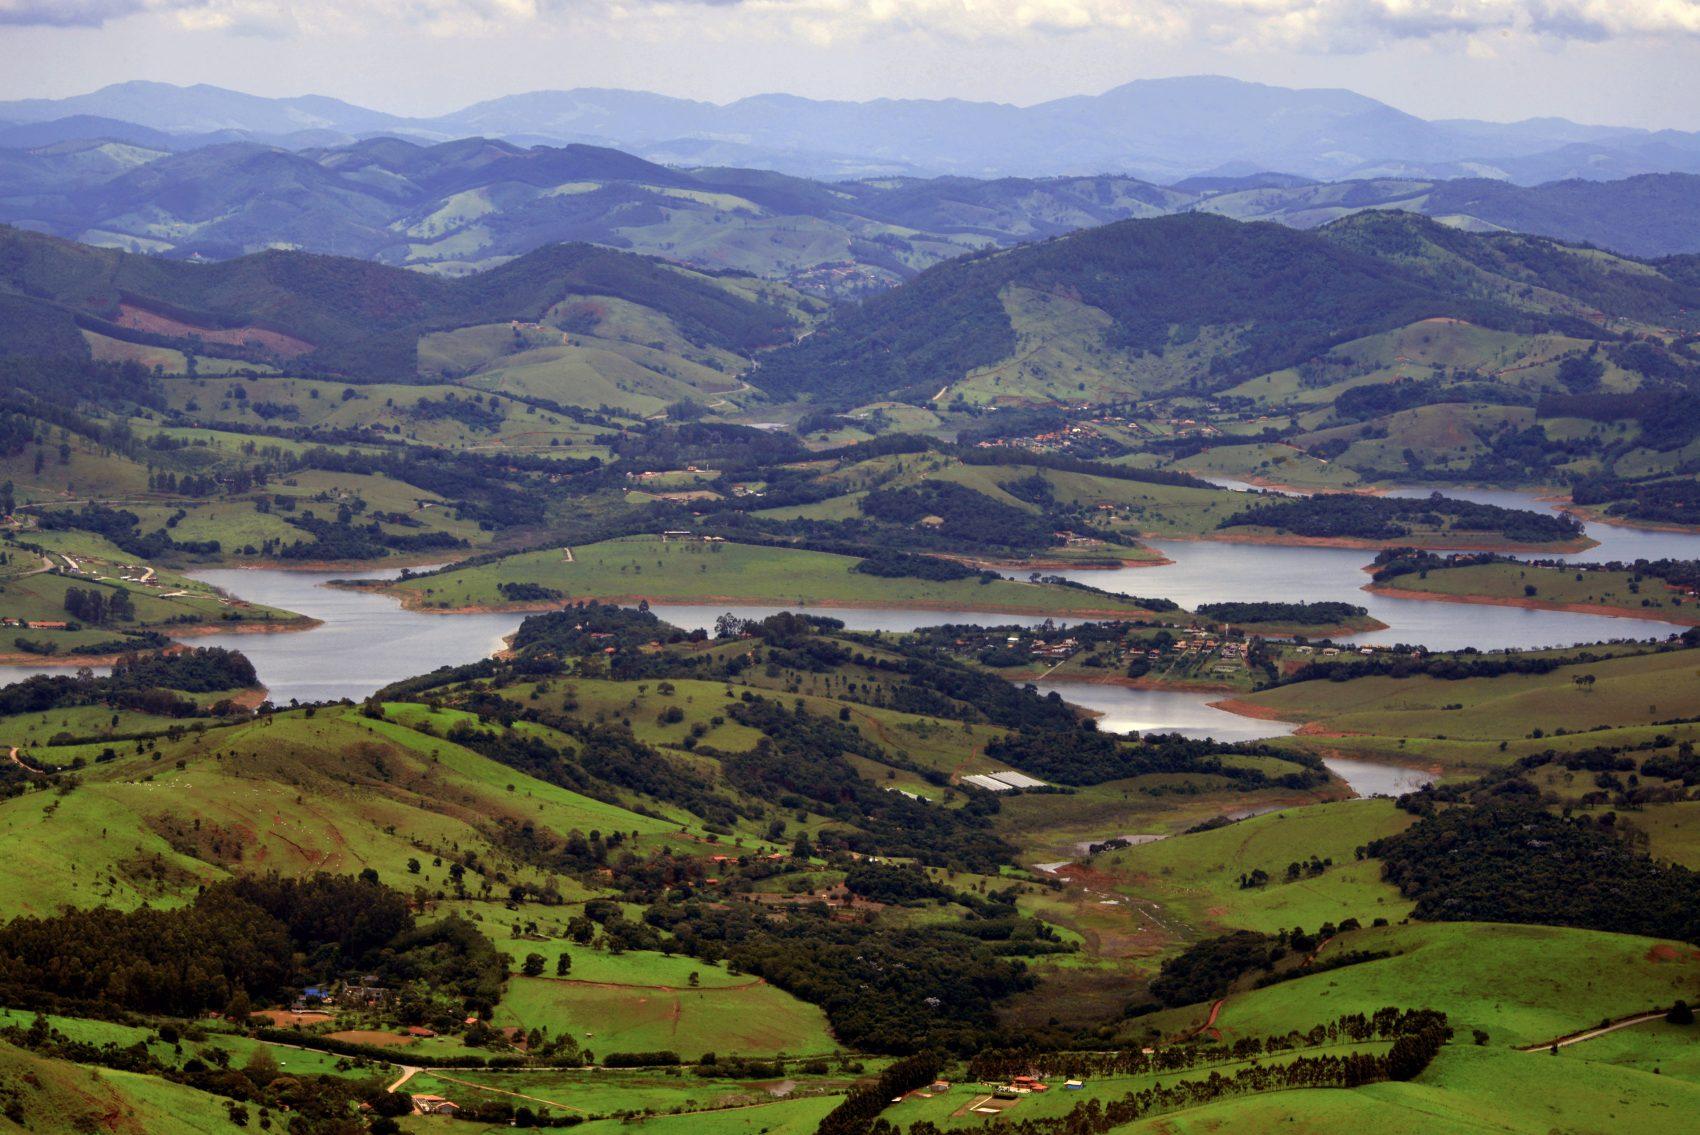 Vista de Extrema do sistema Cantareira. Foto de Mirian Fichtner